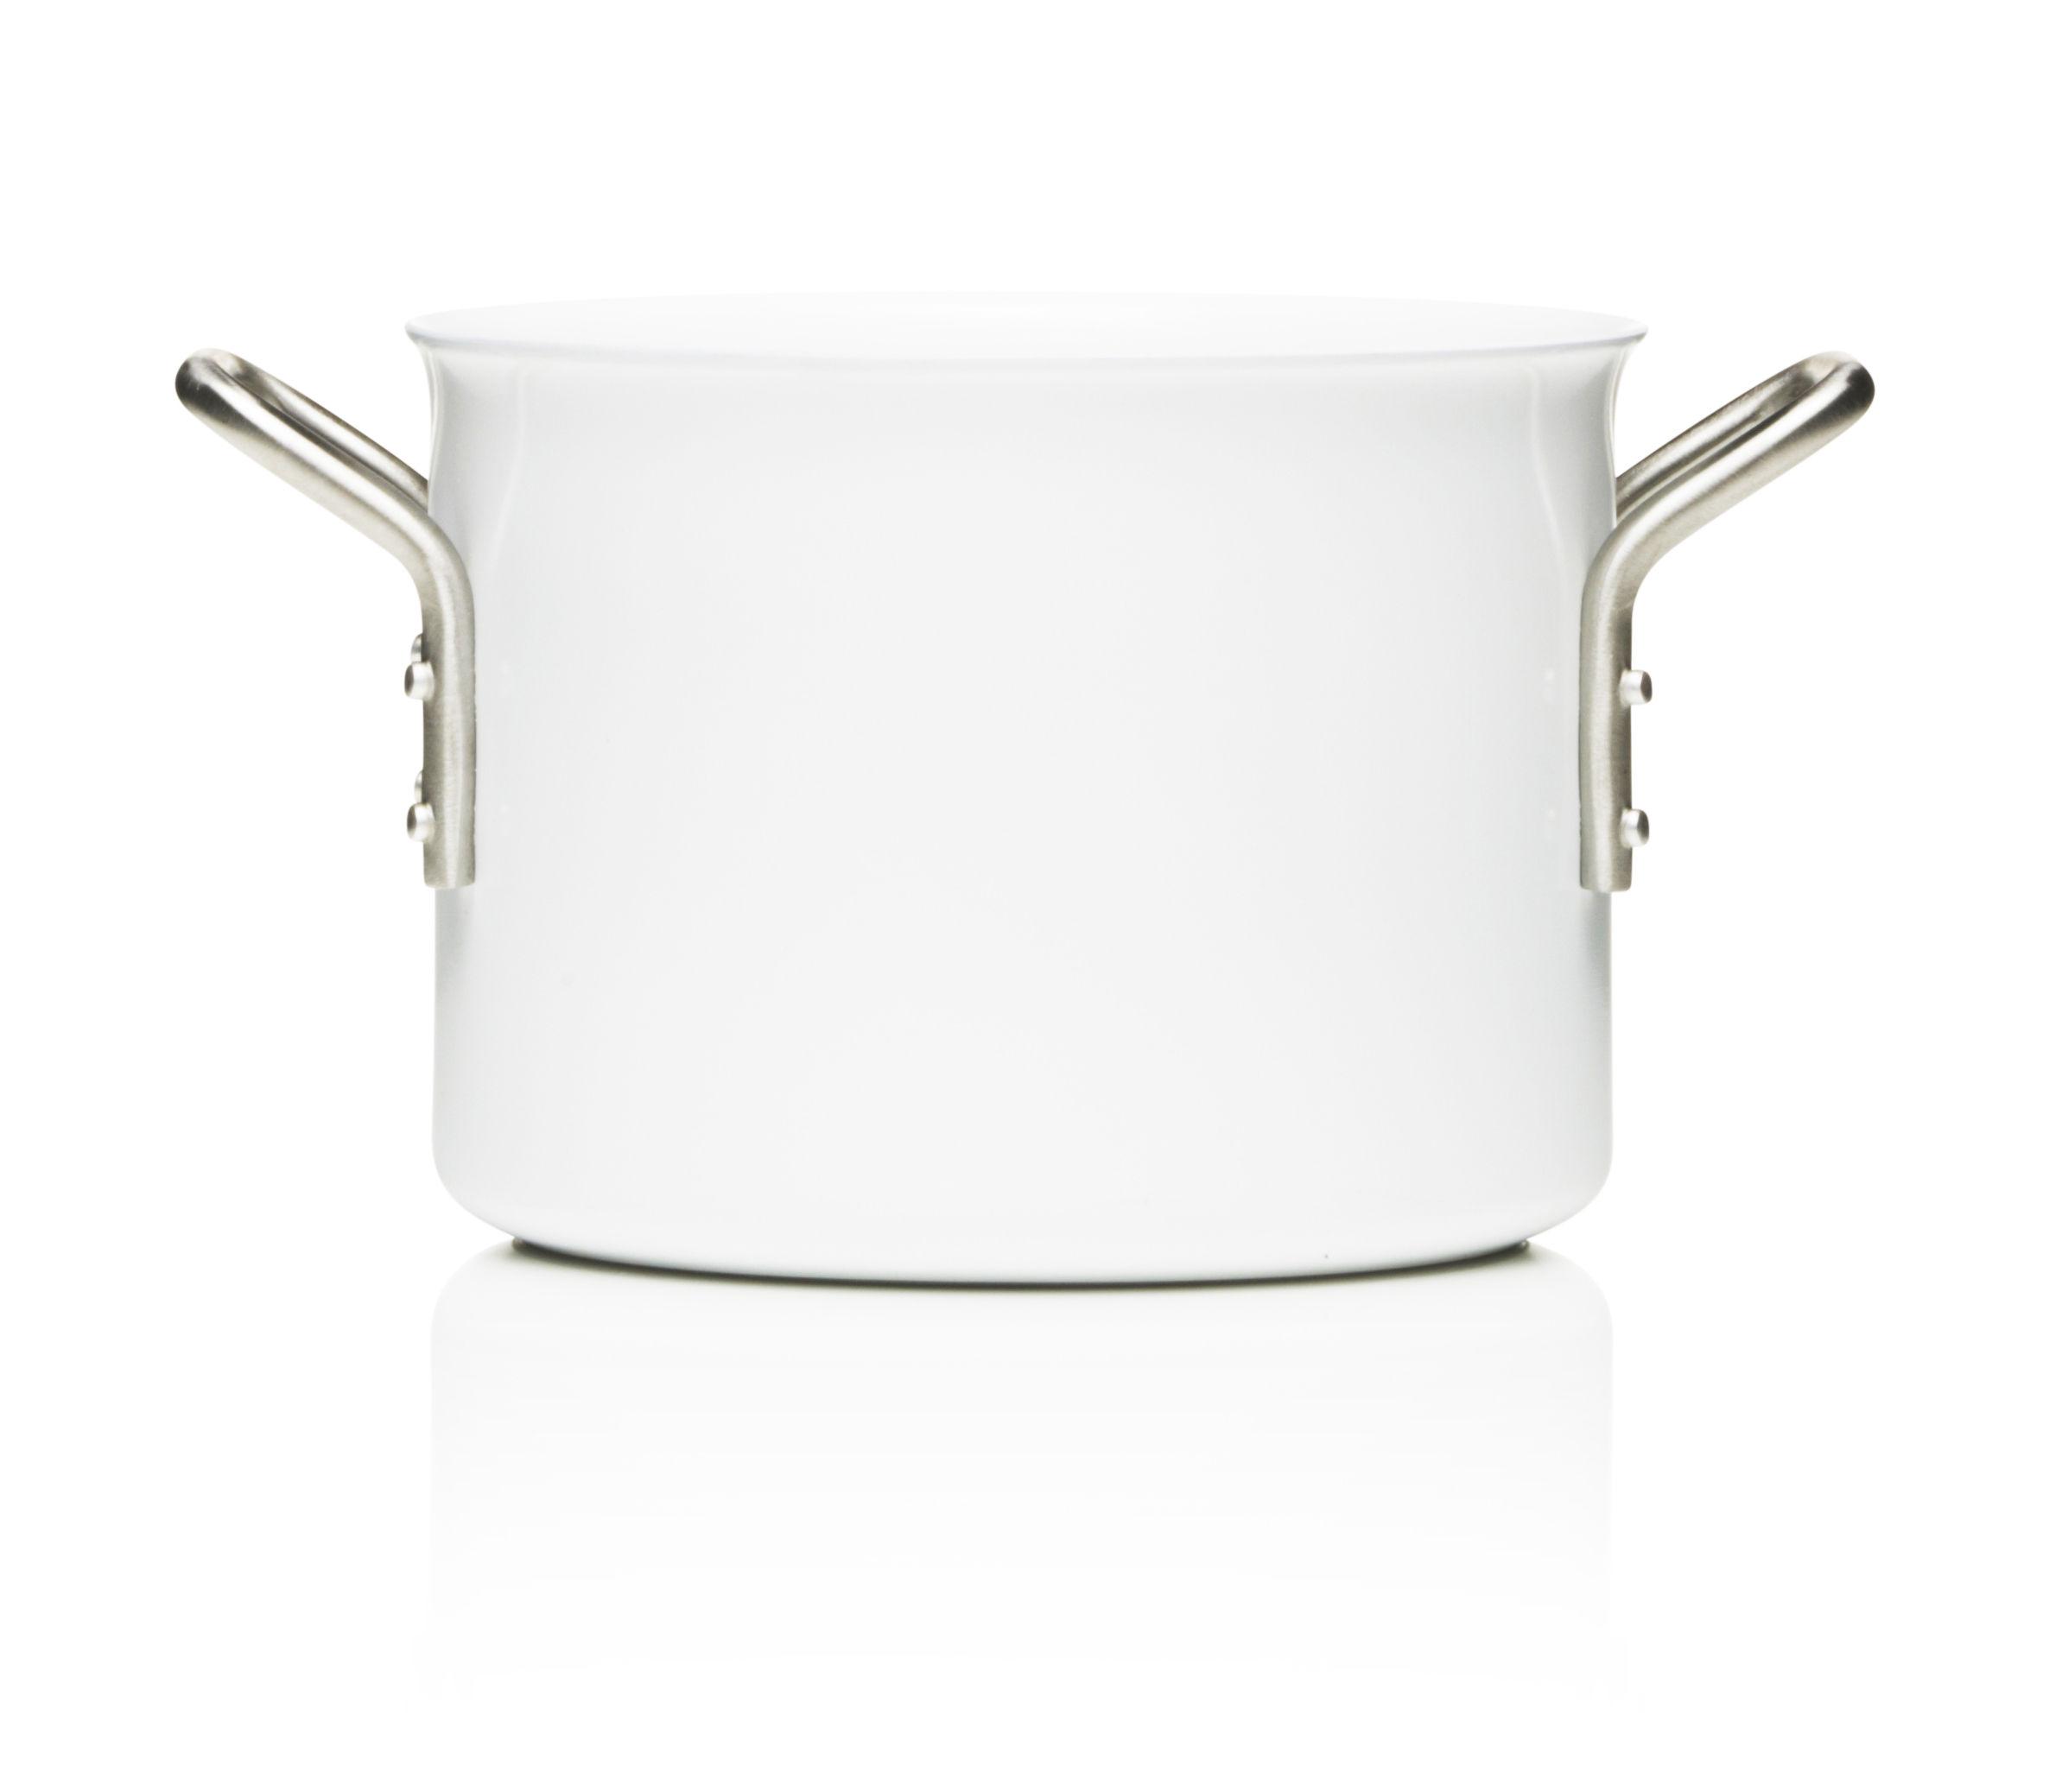 Kitchenware - Pots & Pans - White Line Saucepan - 2,5L - Web exclusivity by Eva Trio - White - Aluminium, Ceramic, Stainless steel